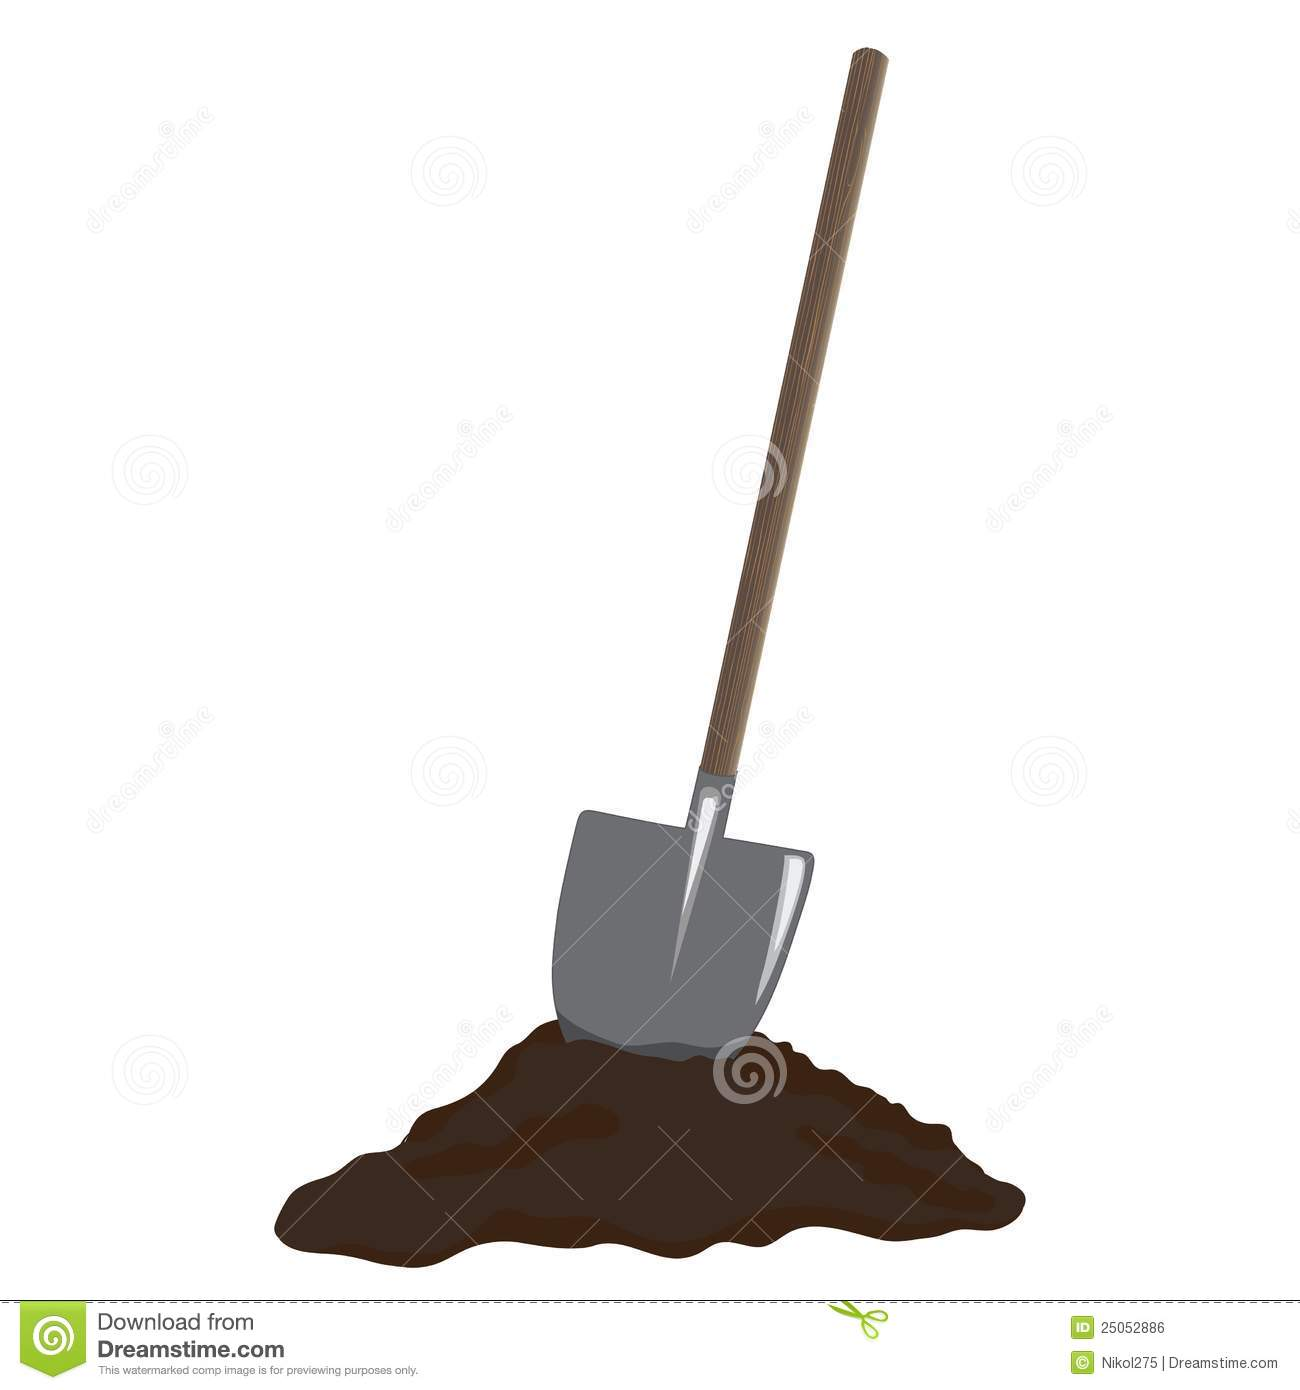 737 Shovel free clipart.